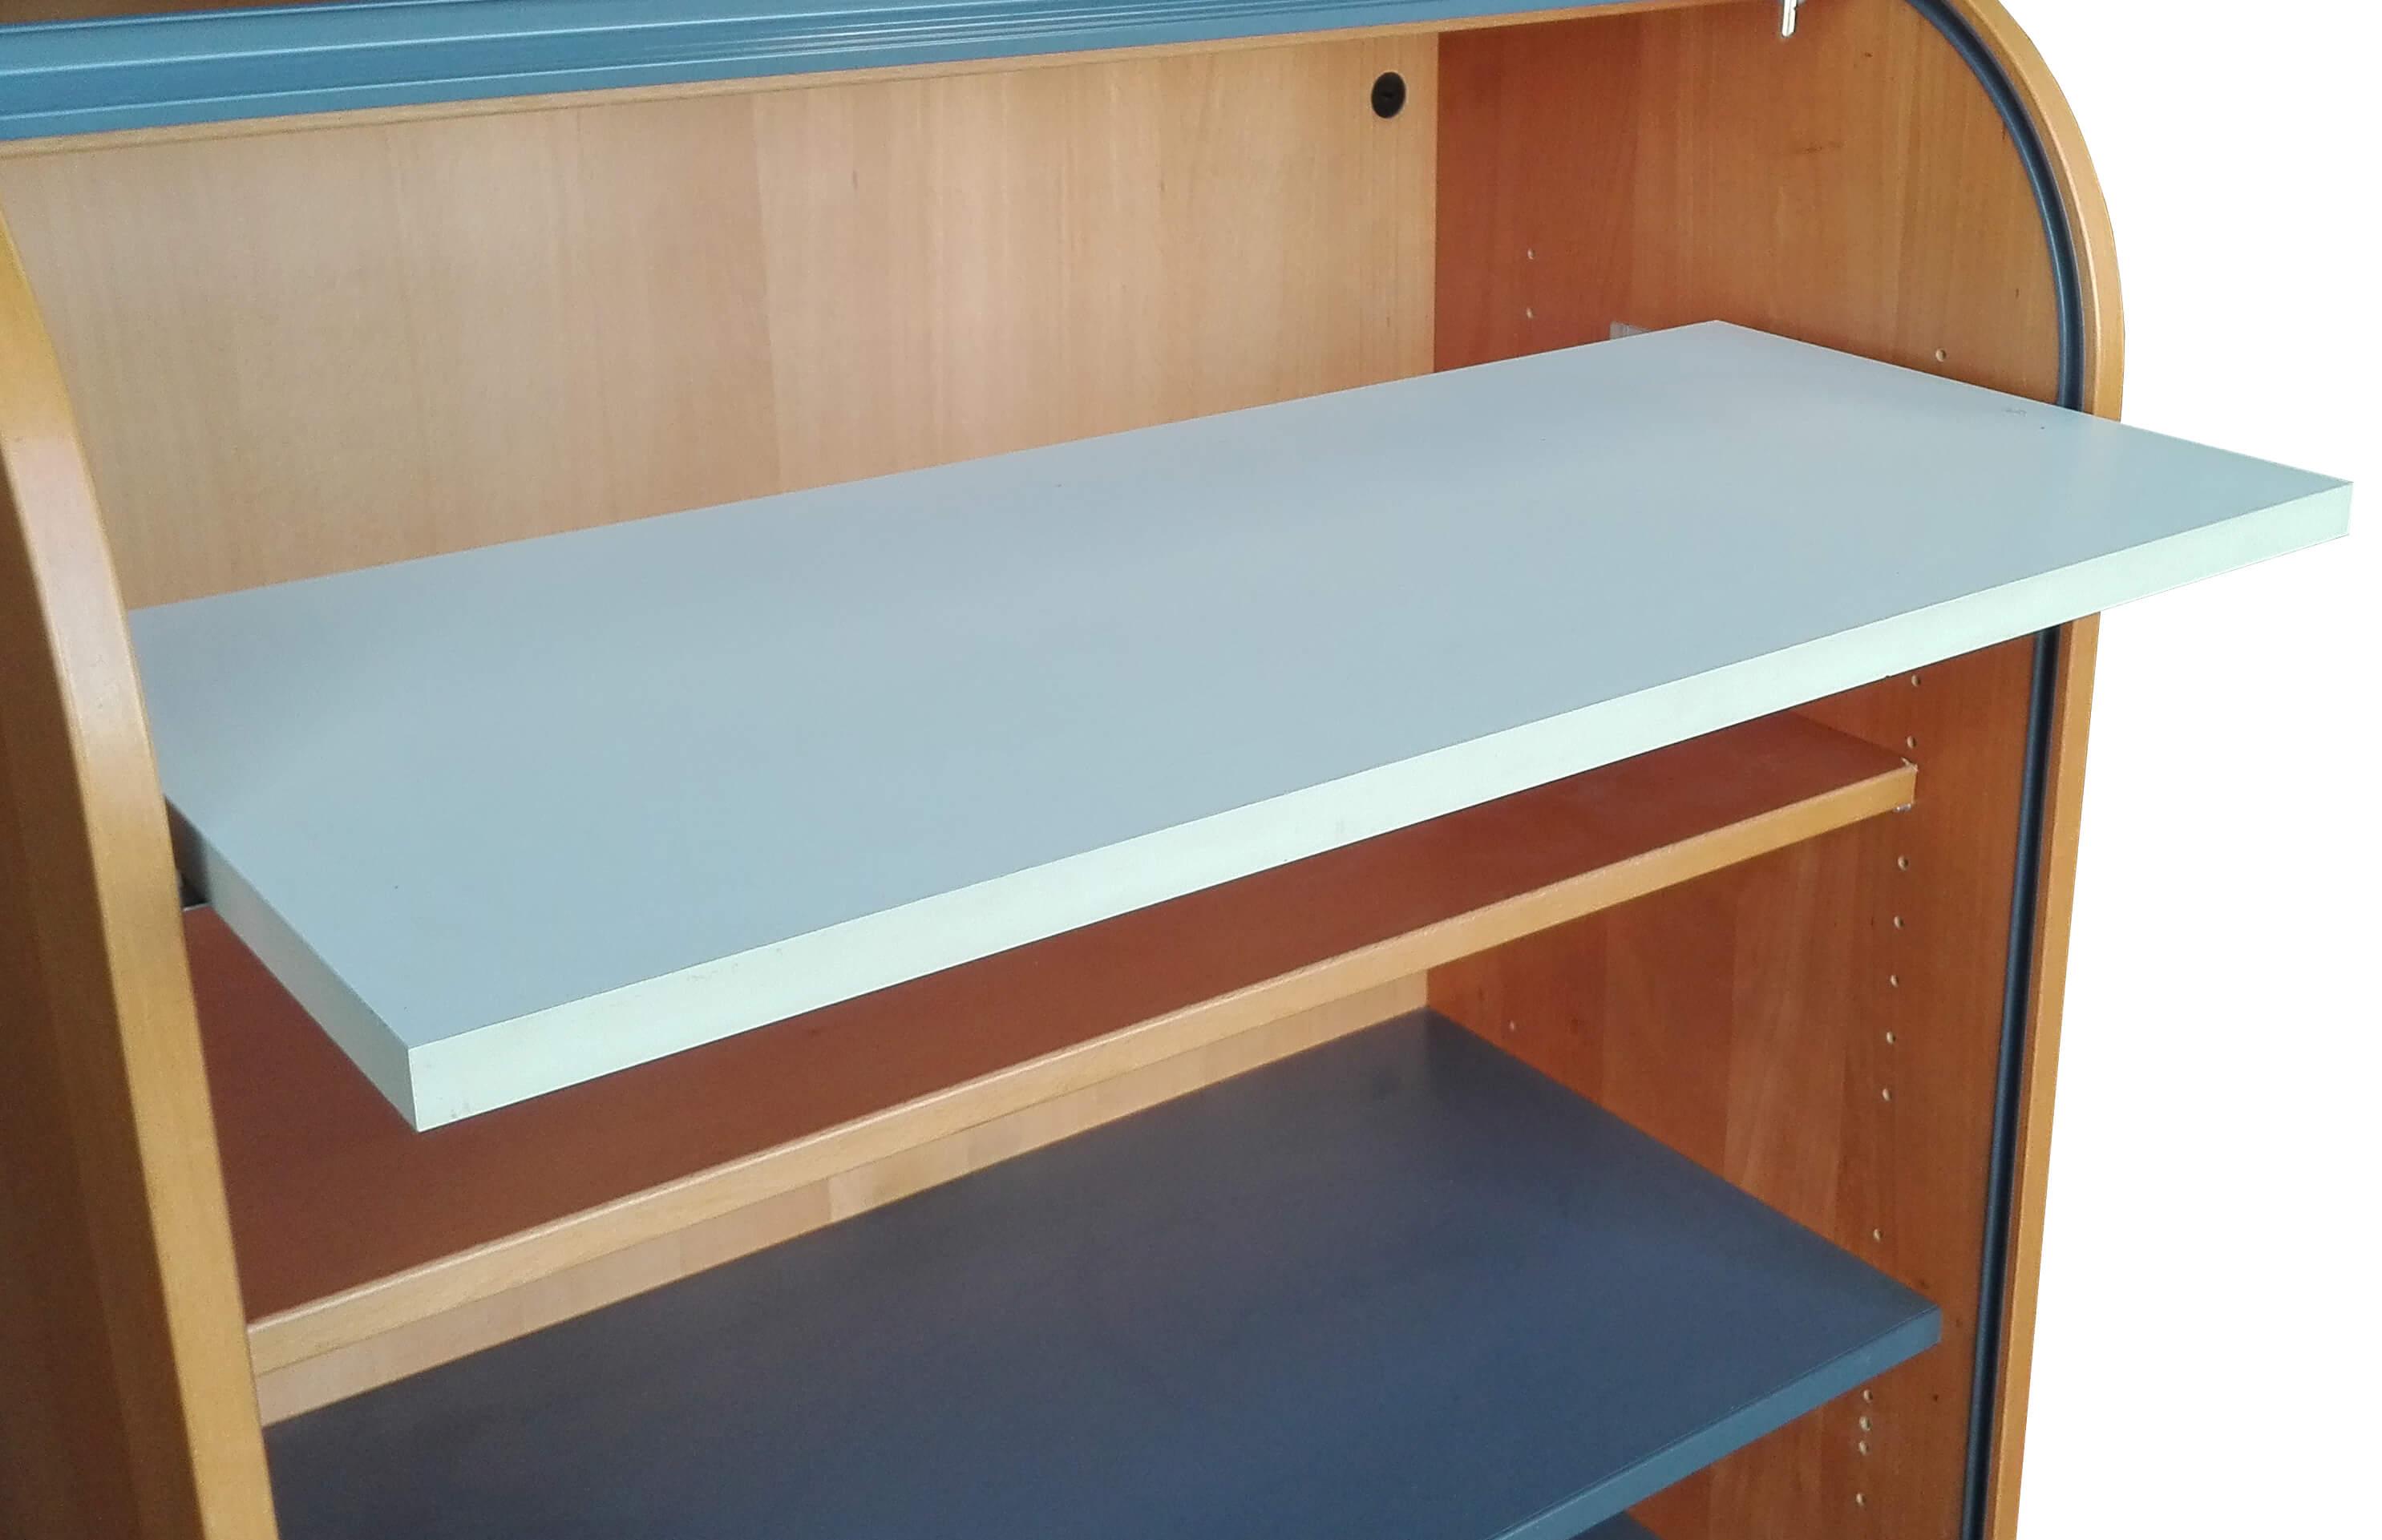 ikea effektiv schrank holzjalousie buche 139x84x50cm 220147709. Black Bedroom Furniture Sets. Home Design Ideas